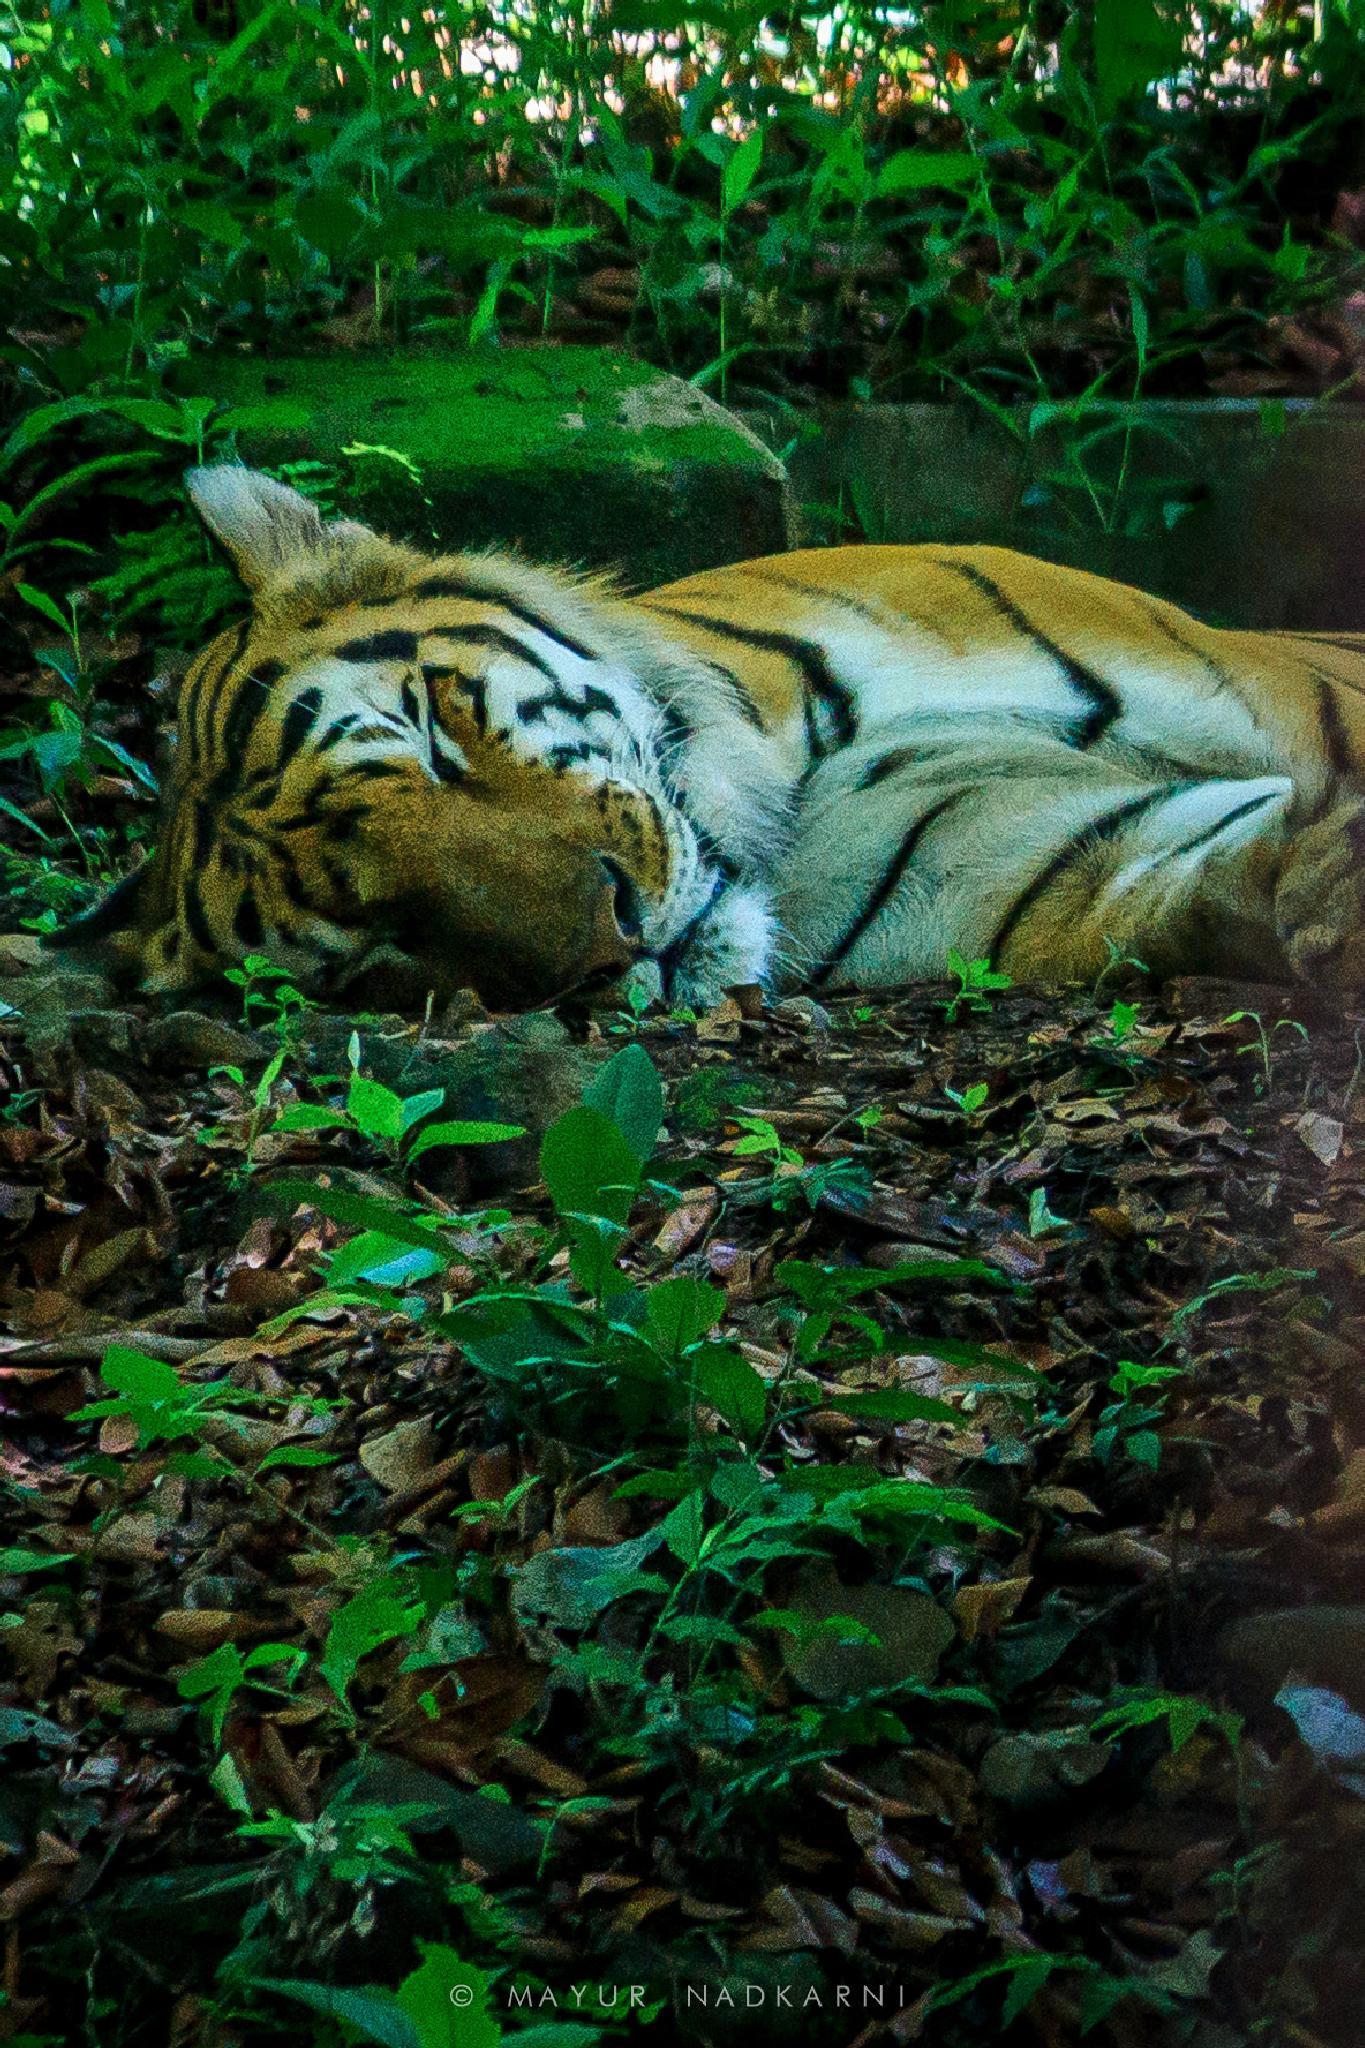 Eye of the Tiger by Mayur Nadkarni